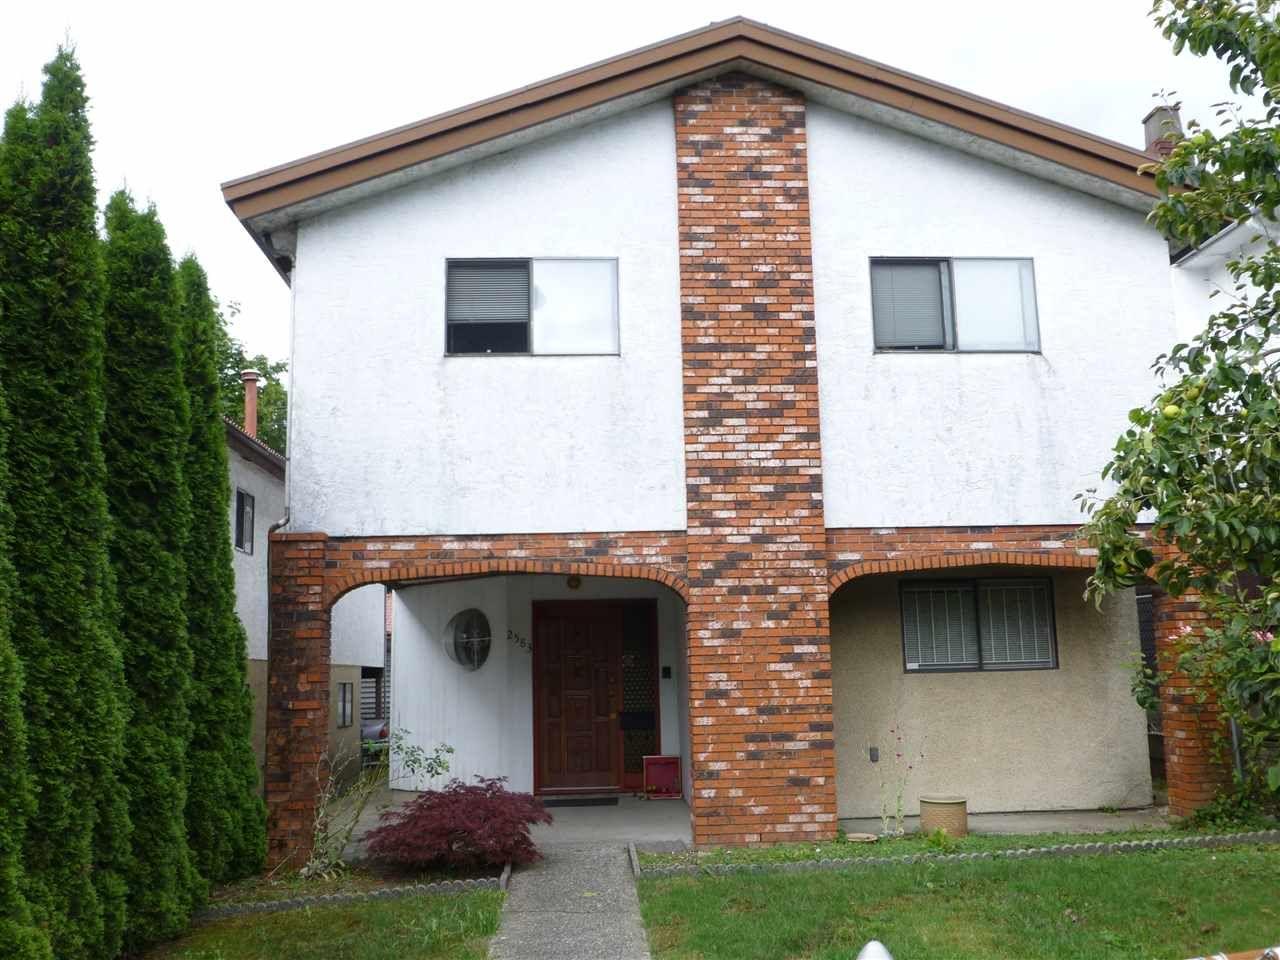 Main Photo: 2583 RENFREW Street in Vancouver: Renfrew VE House for sale (Vancouver East)  : MLS®# R2094540